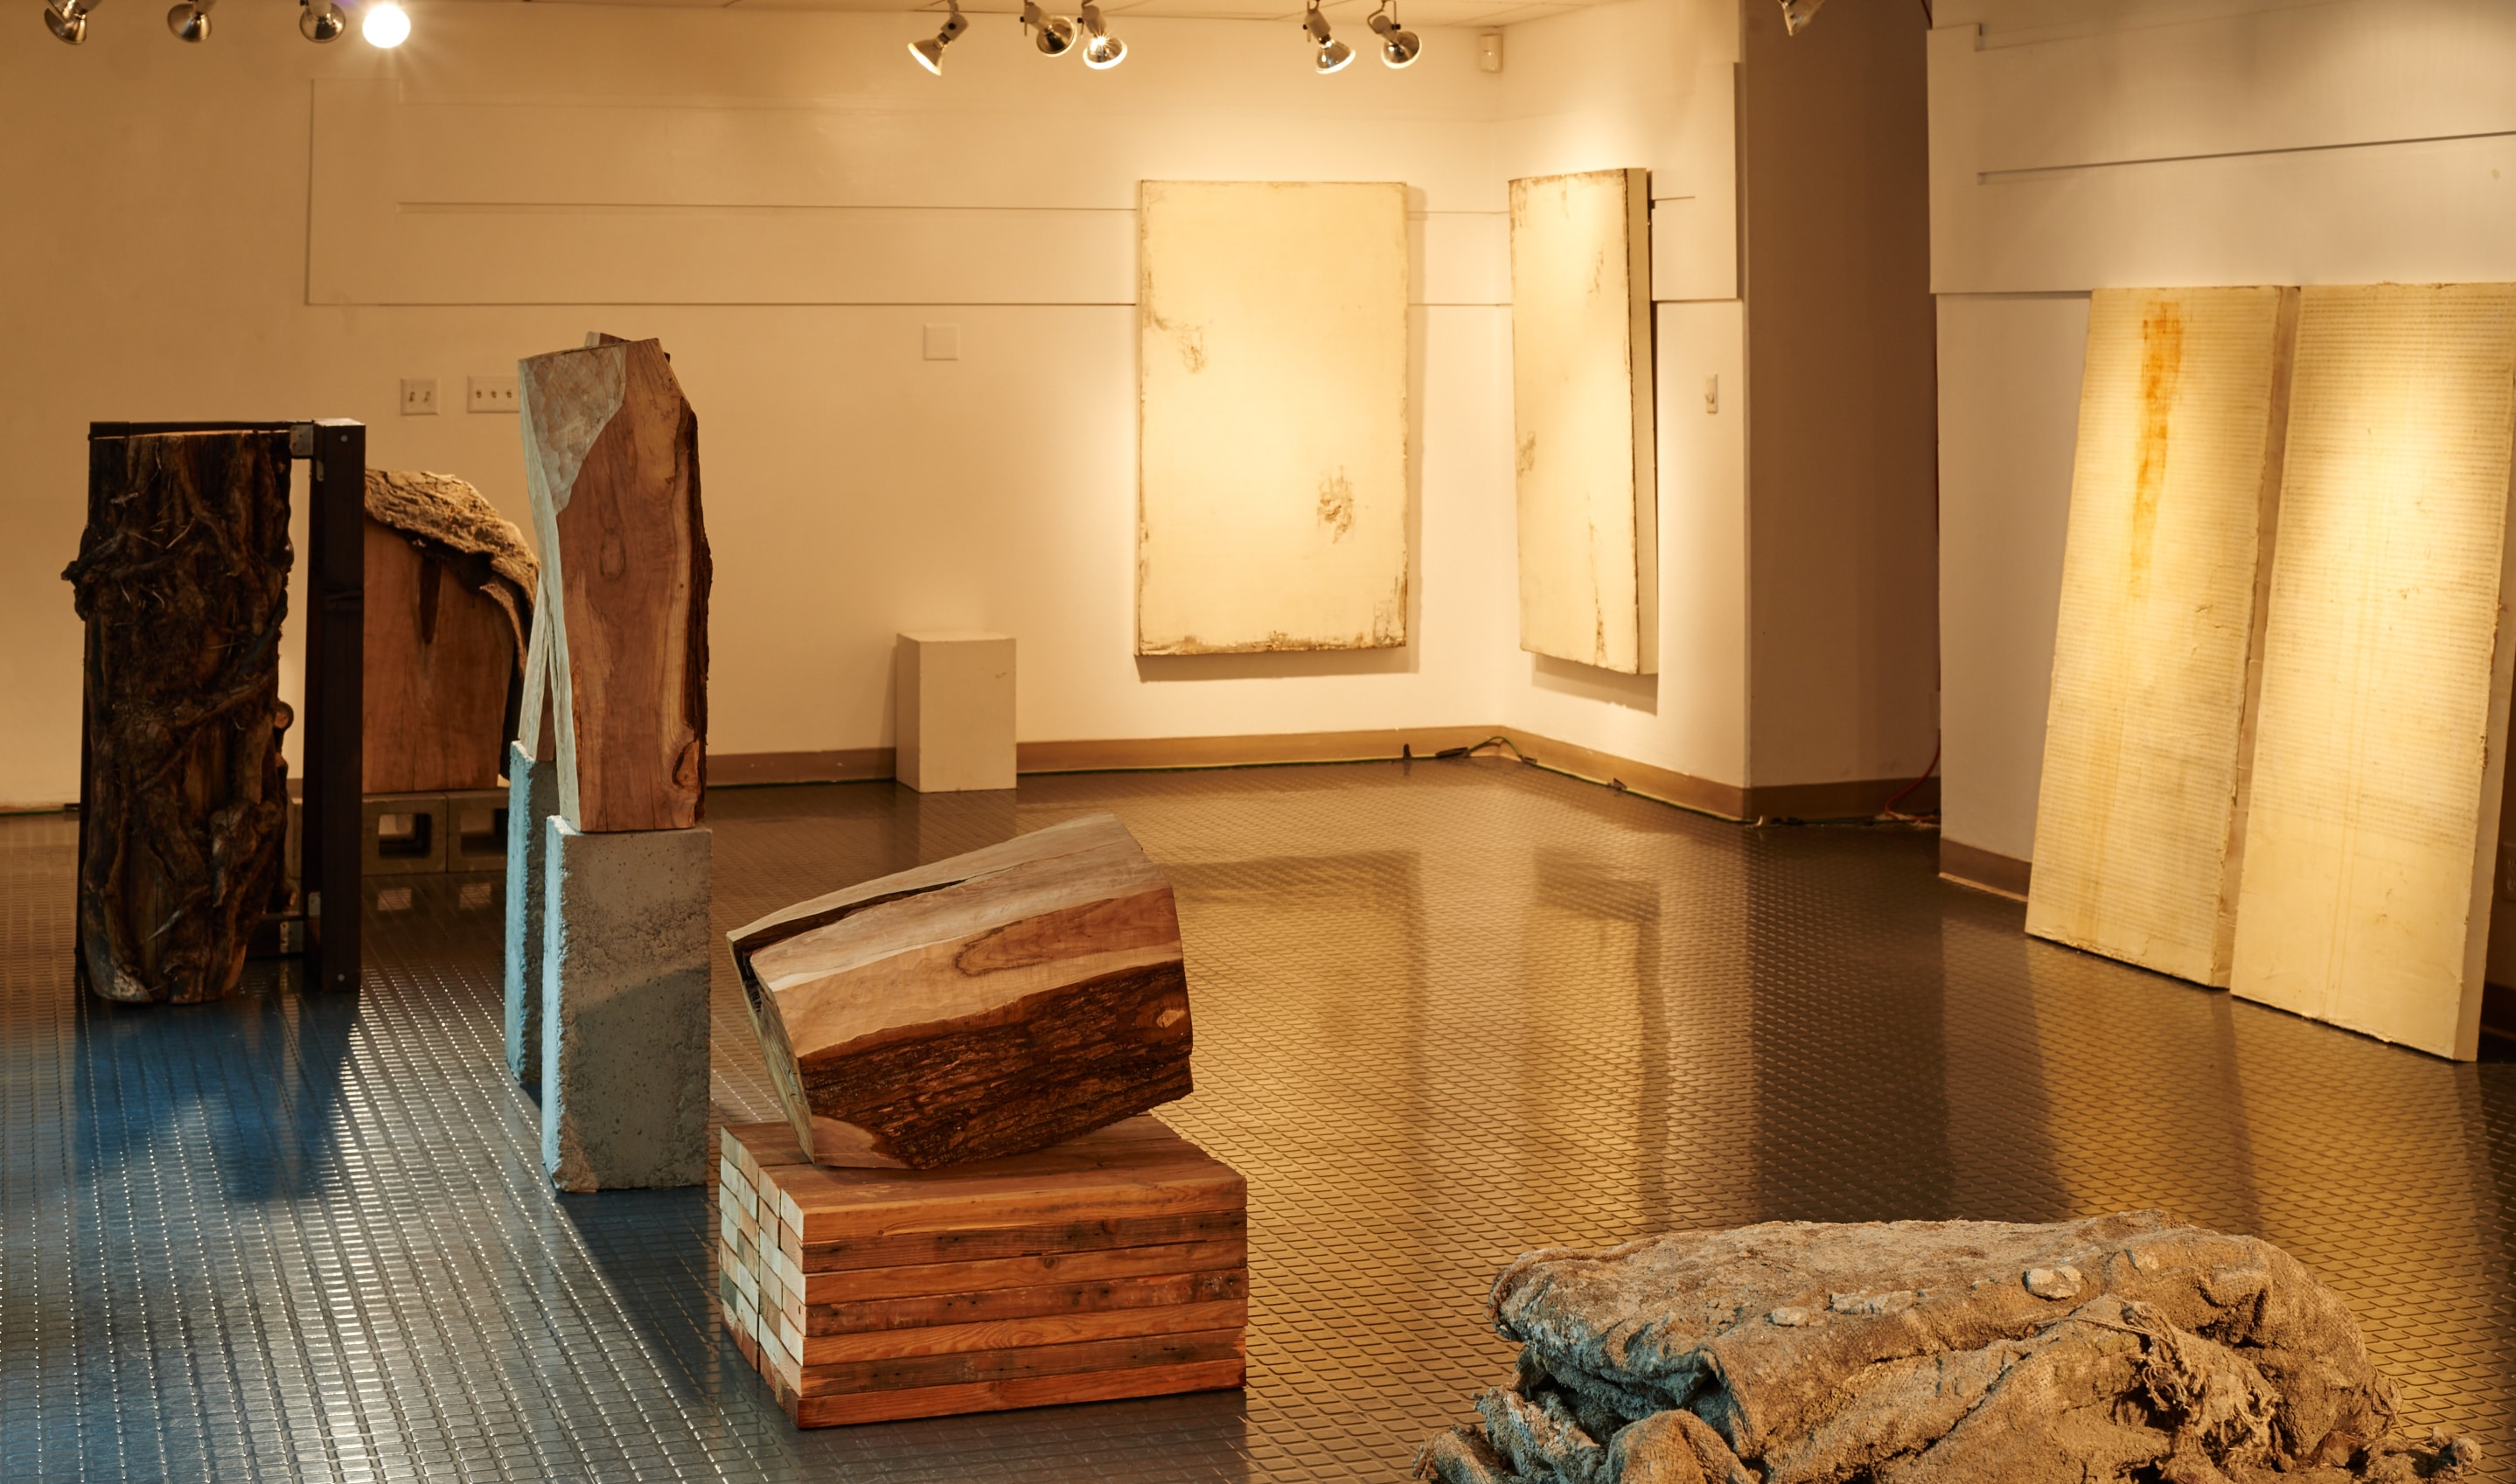 Gallery Installation, 2015